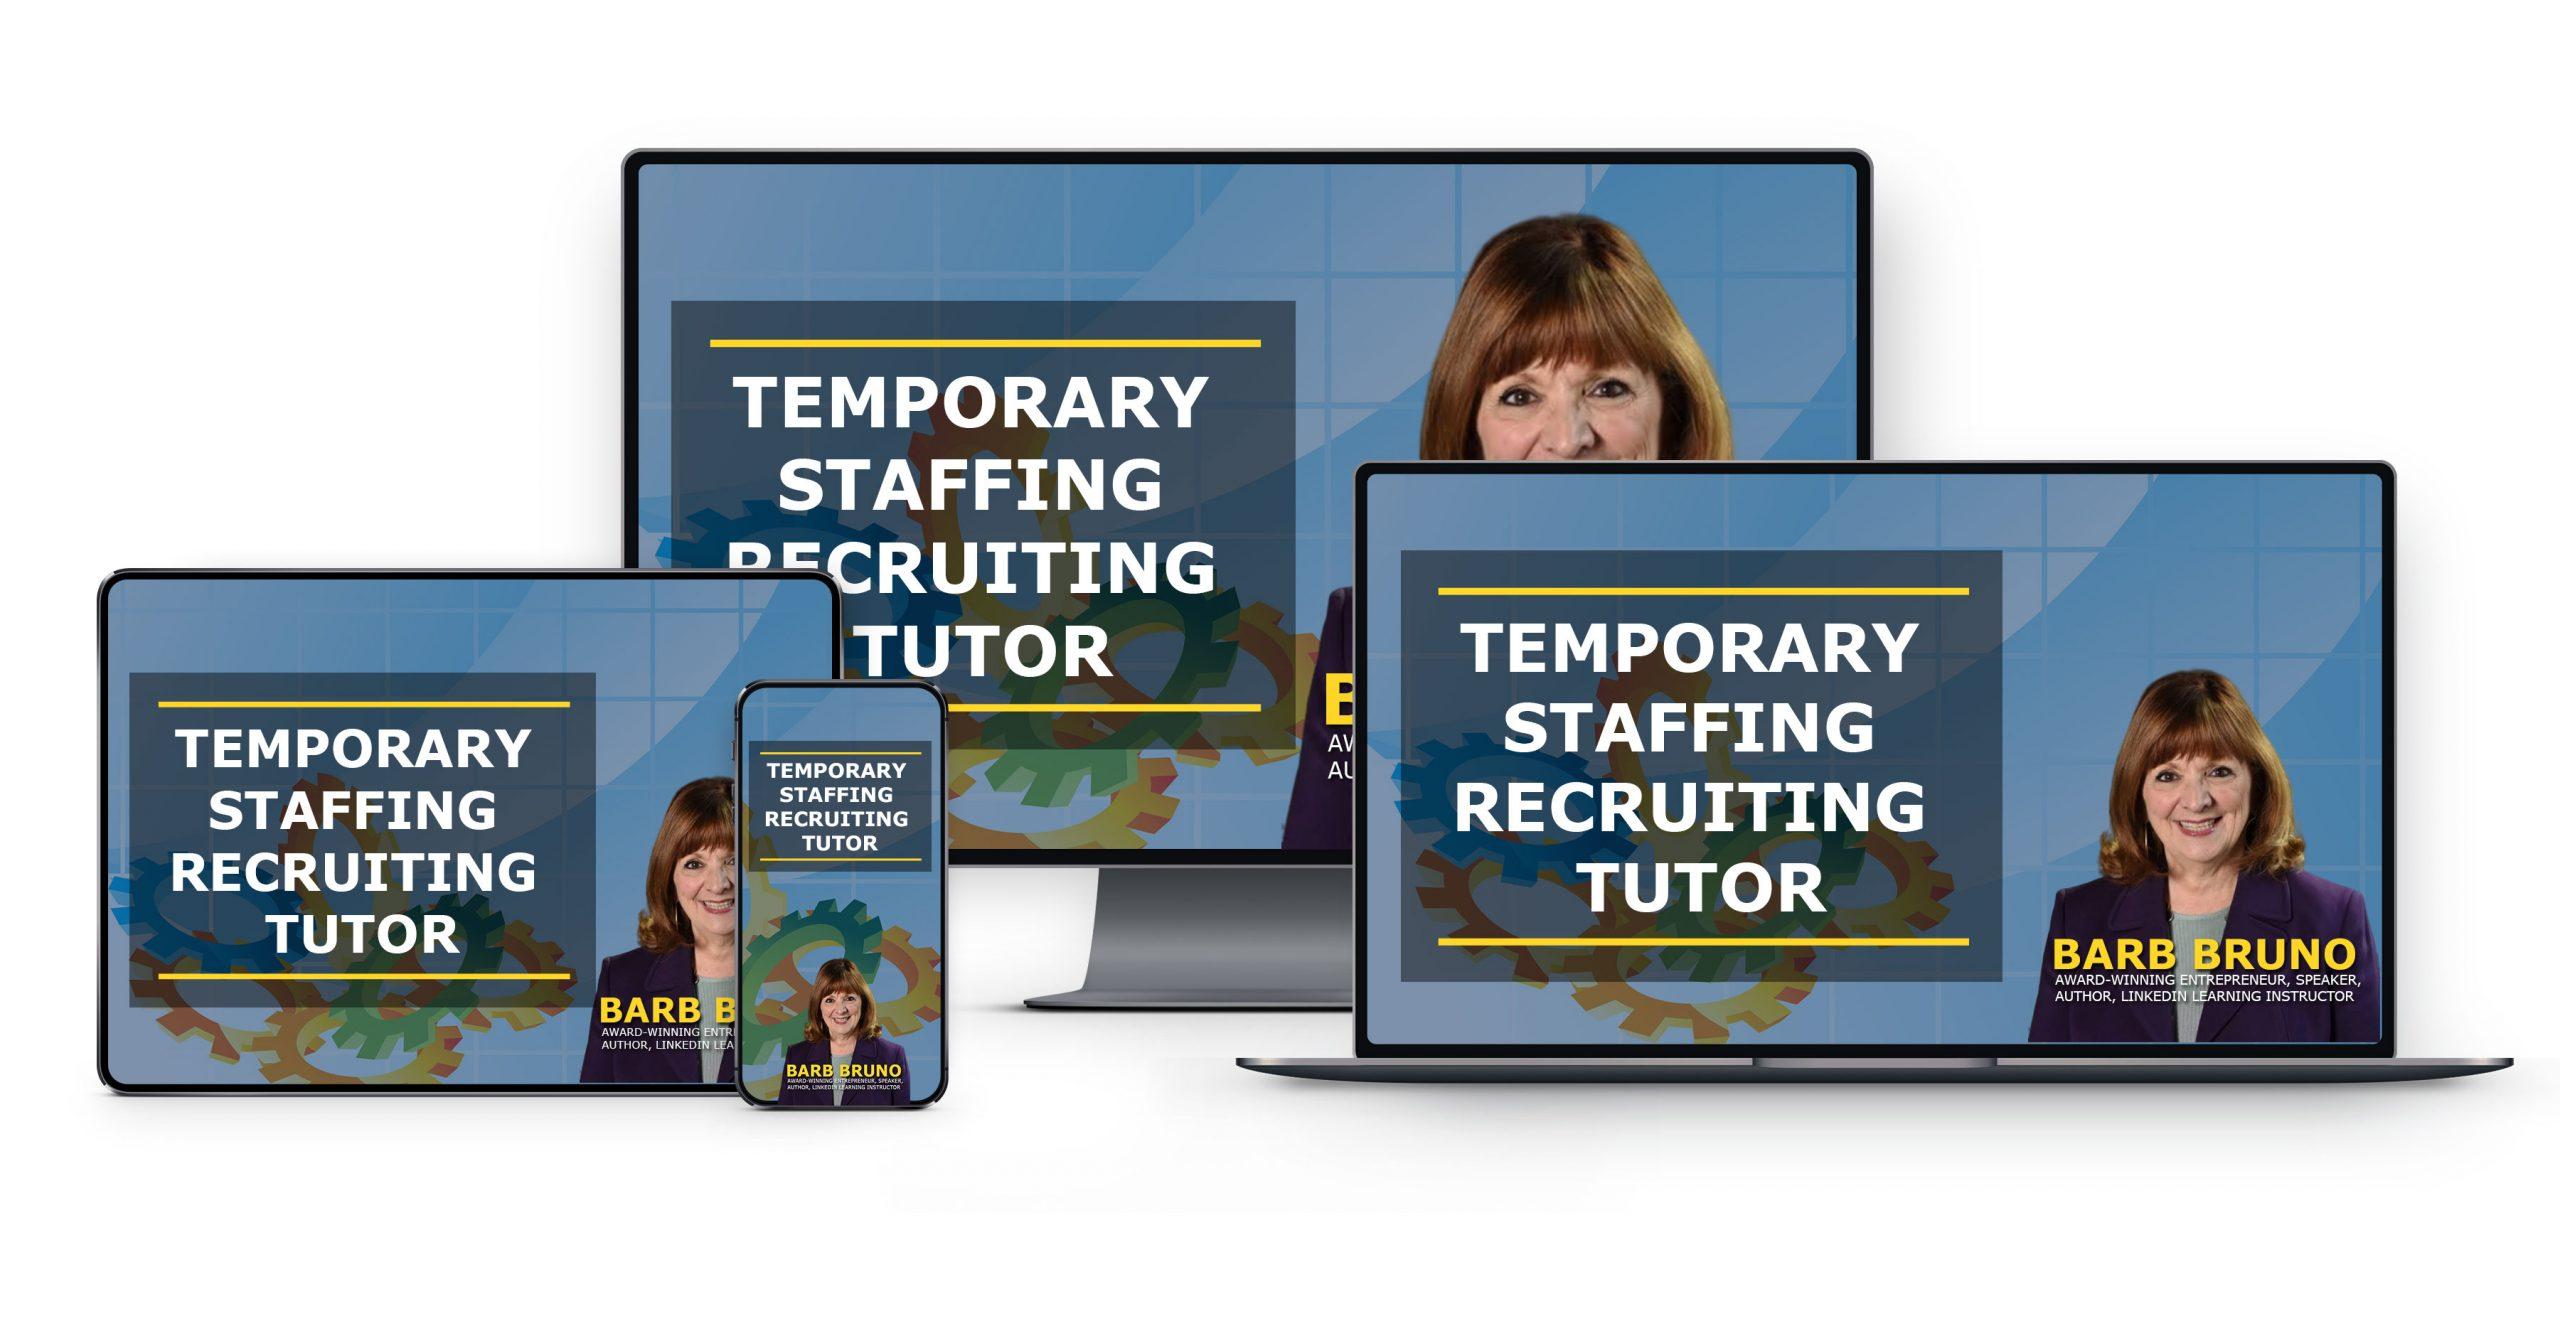 temporary-staffing-recruiting-tutor